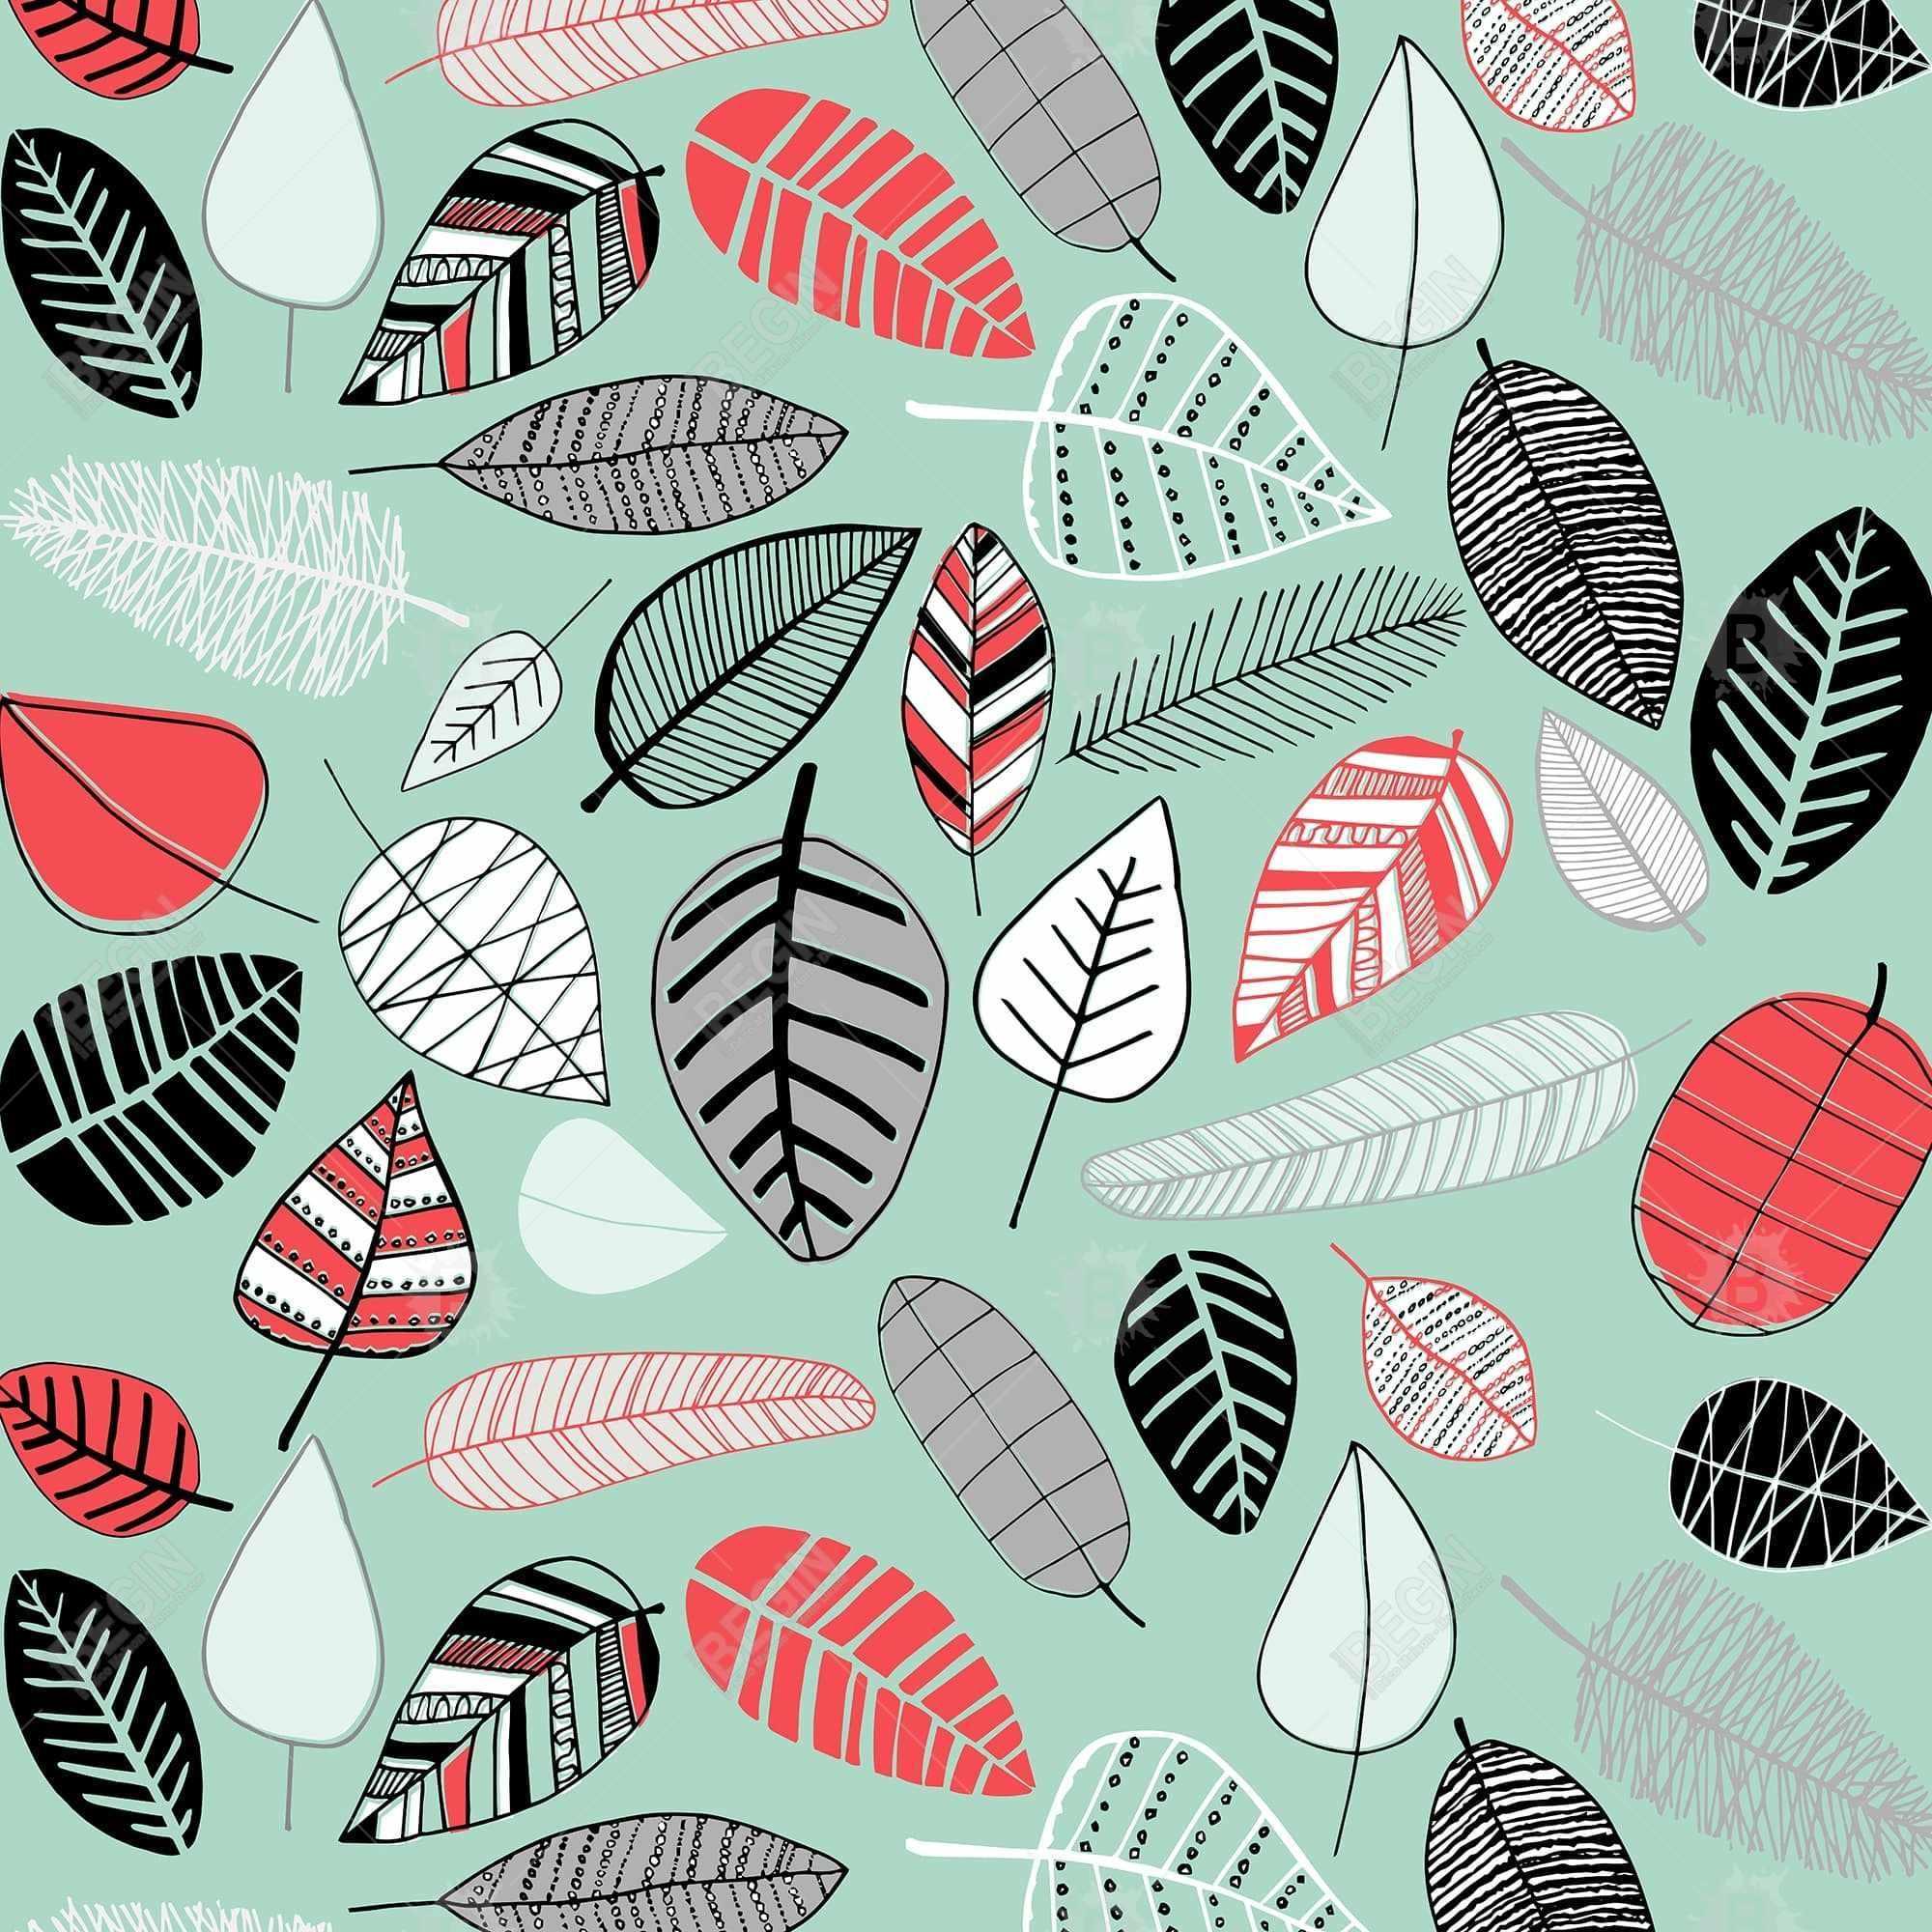 Turquoise leaf patterns